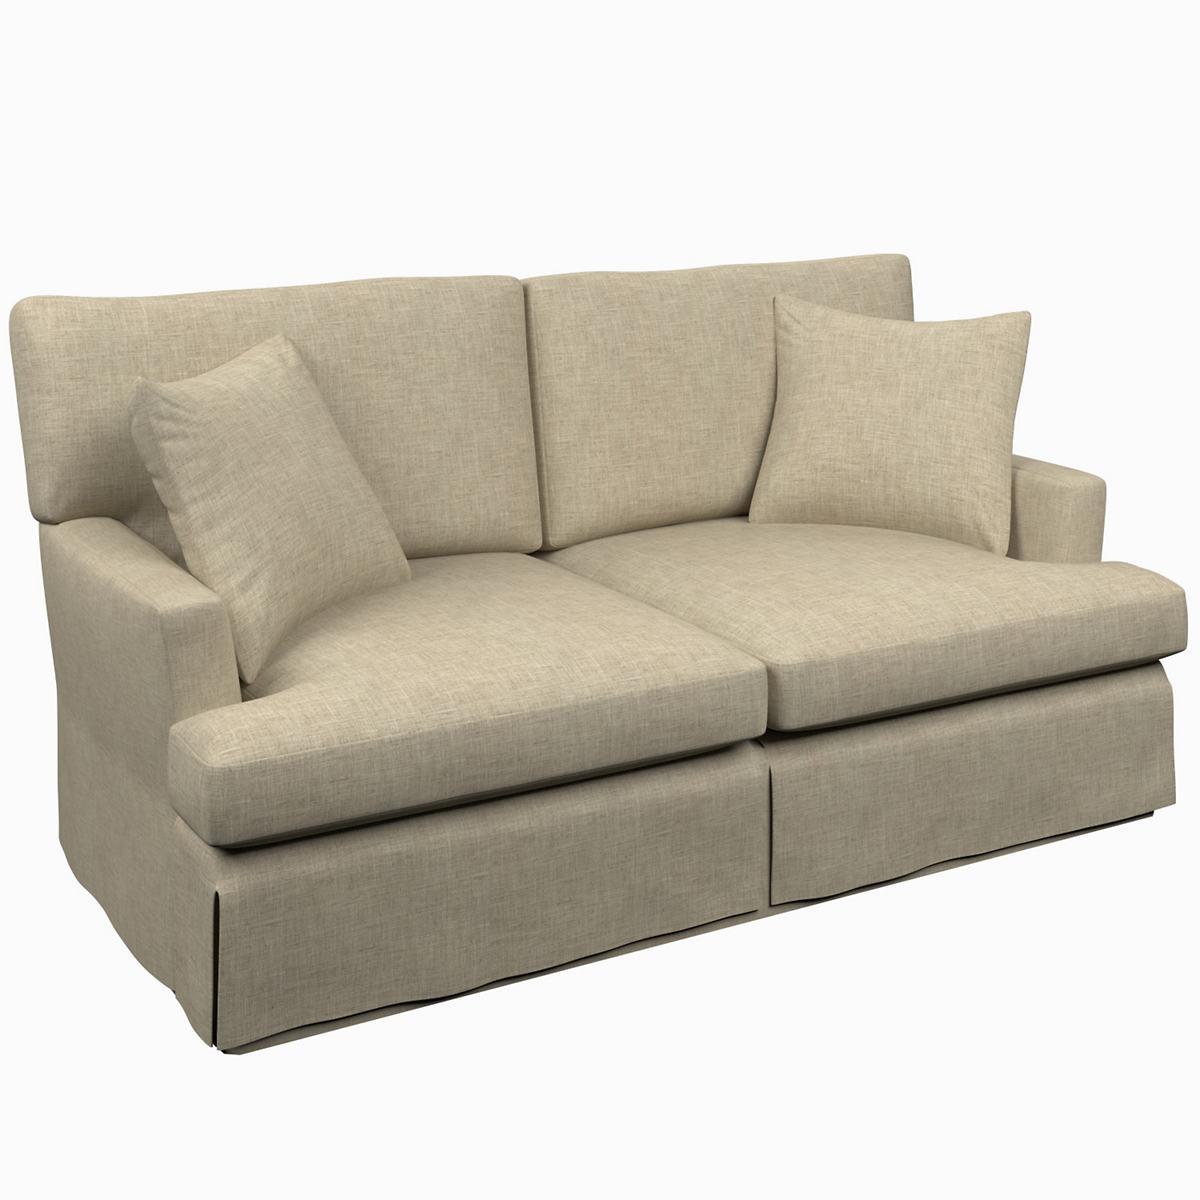 Greylock Grey Saybrook 2 Seater Upholstered Sofa